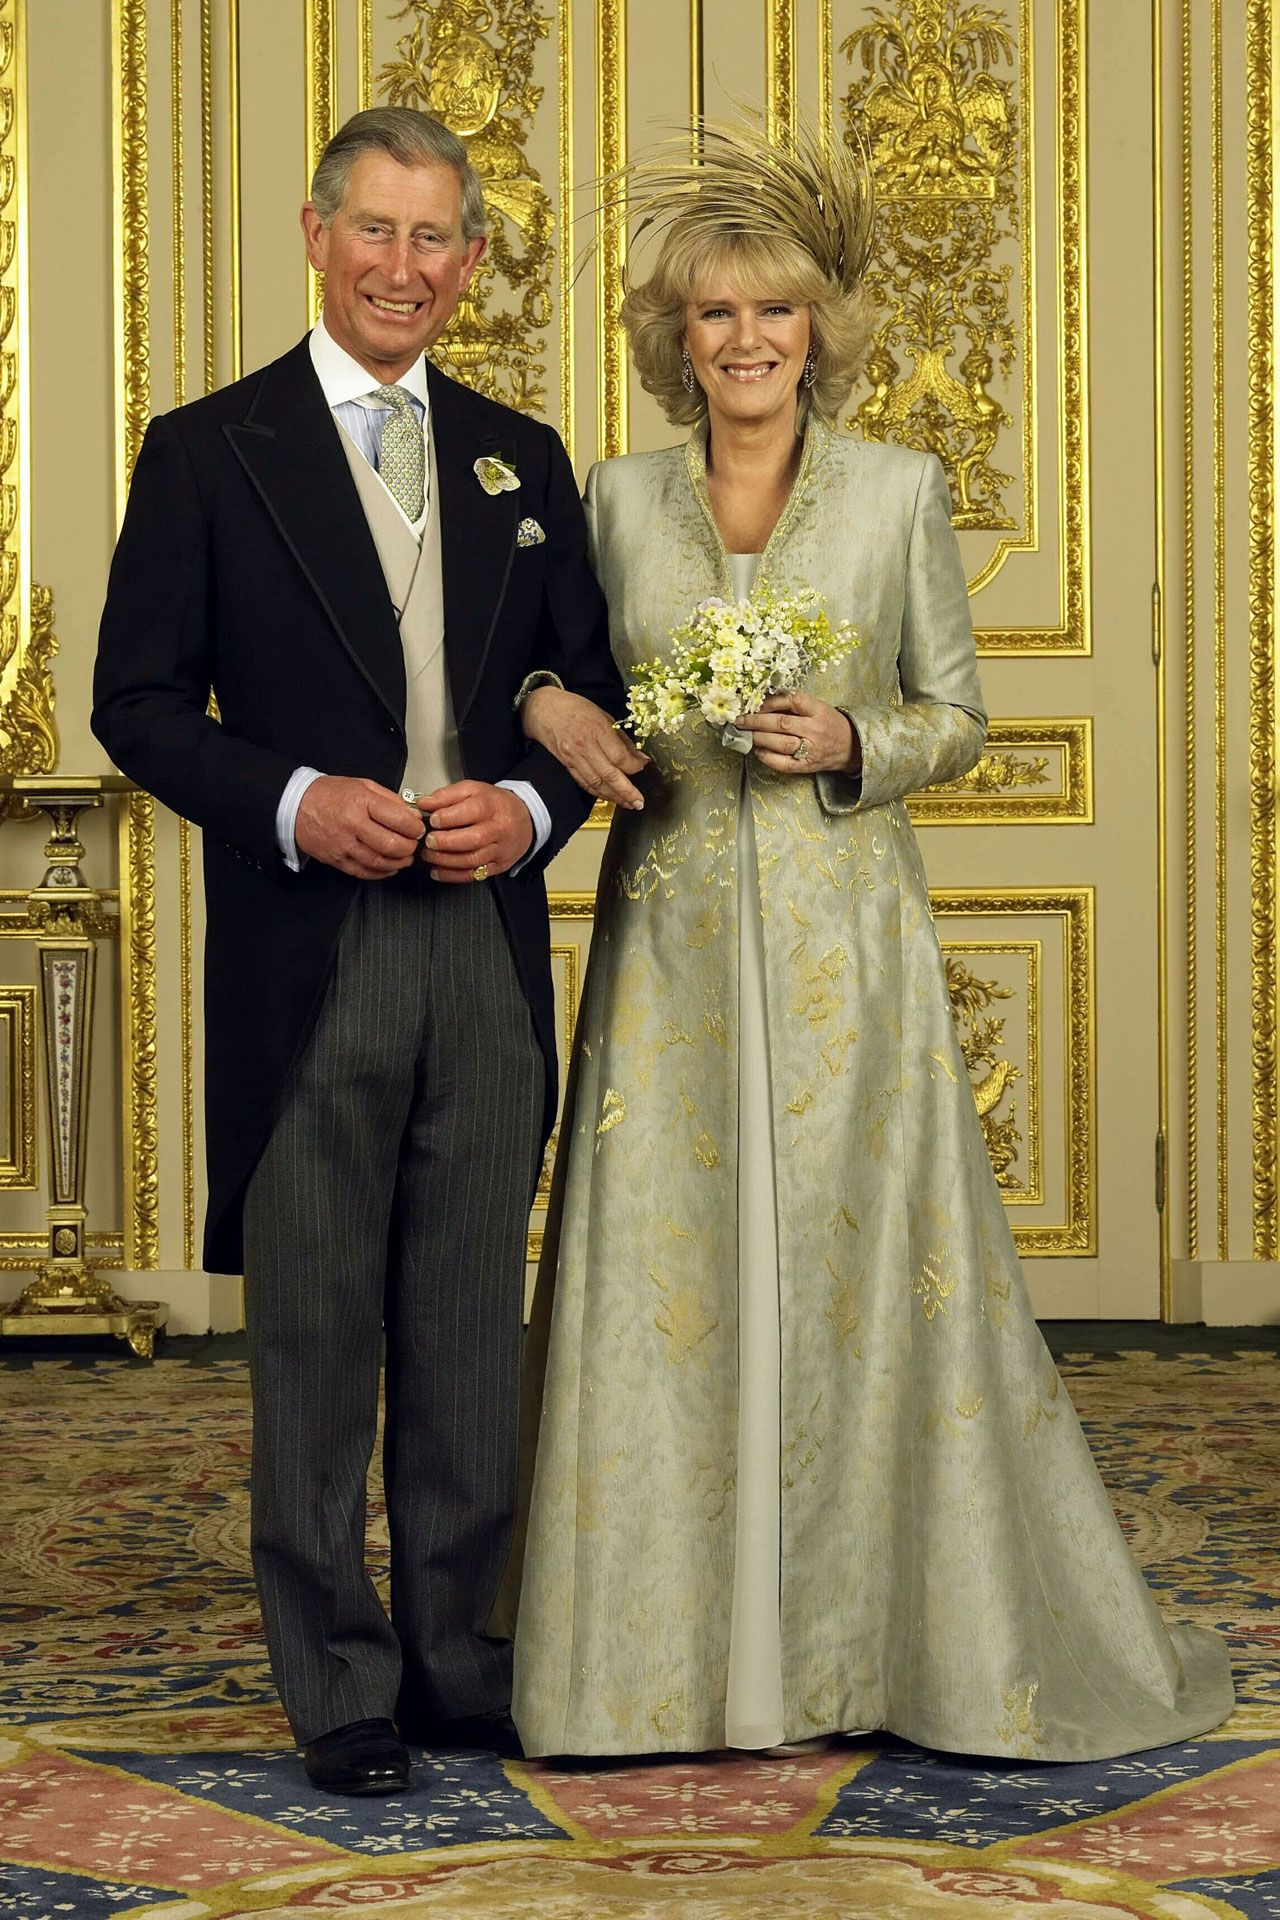 Wedding Ideas, Planning & Inspiration Royal wedding